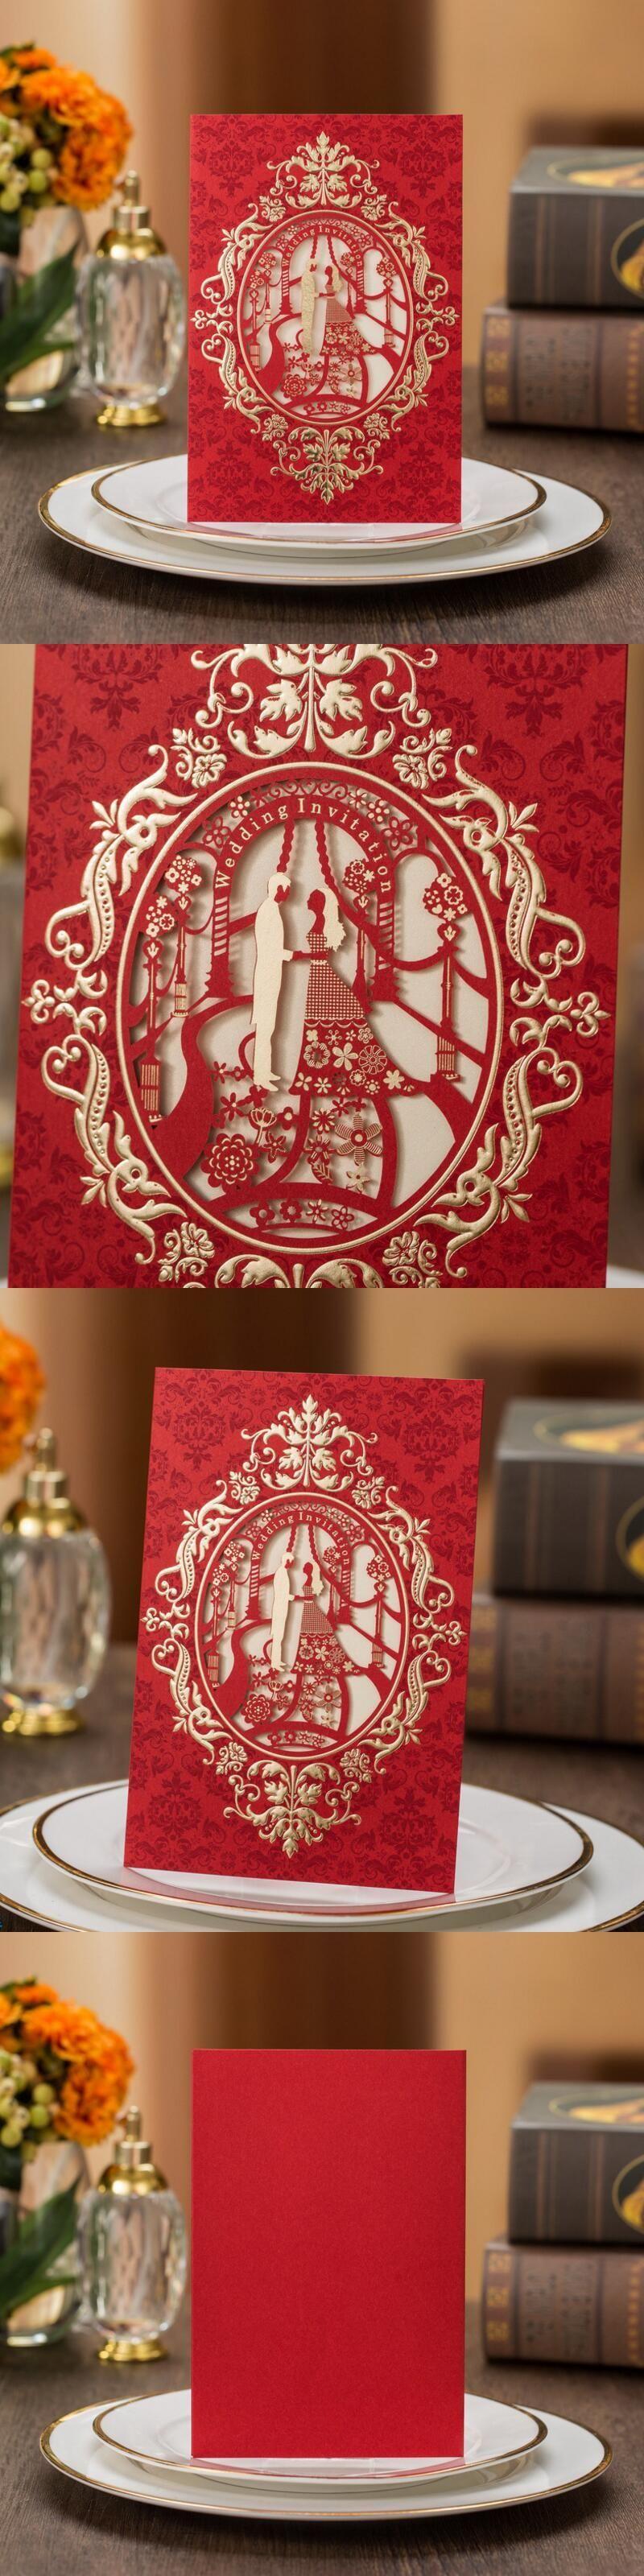 Fashion Wedding Invitation Cards Hollow Paper Frame Church Style ...